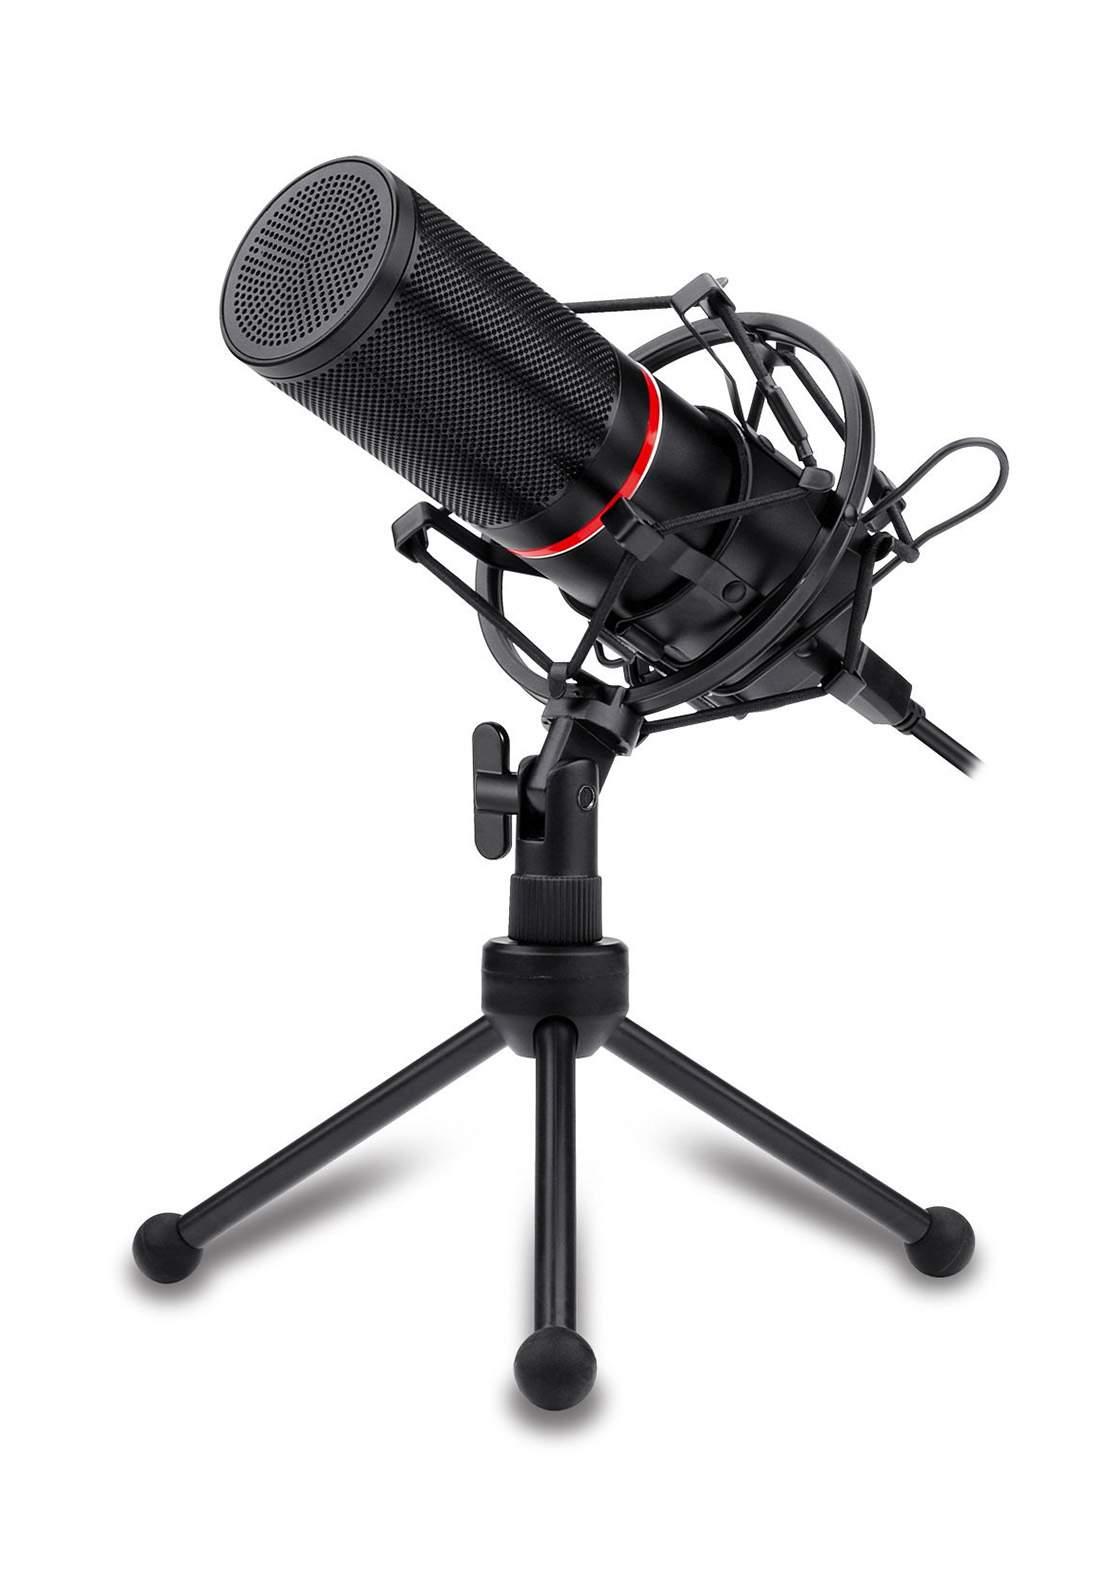 Redragon GM300 Gaming Stream Microphone Kit - Black مايكرفون